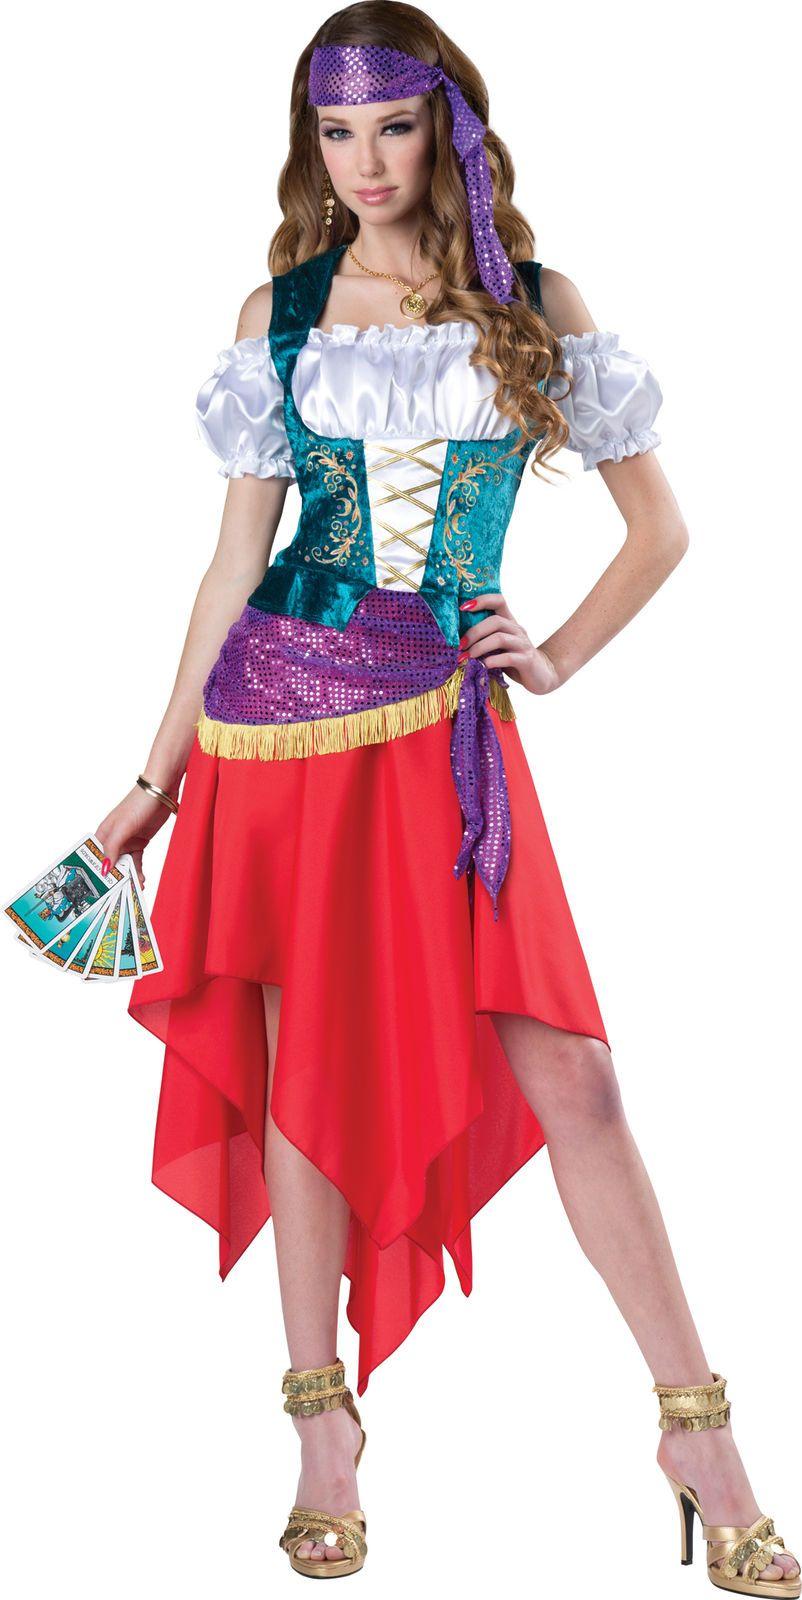 dfff72b912a Mystical Gypsy Woman Costume Traveller Gypsy Outfit Fortune Teller Halloween   HalloweenCostumeForWomen  FancyDress  AdultCostume  WomenCostume ...